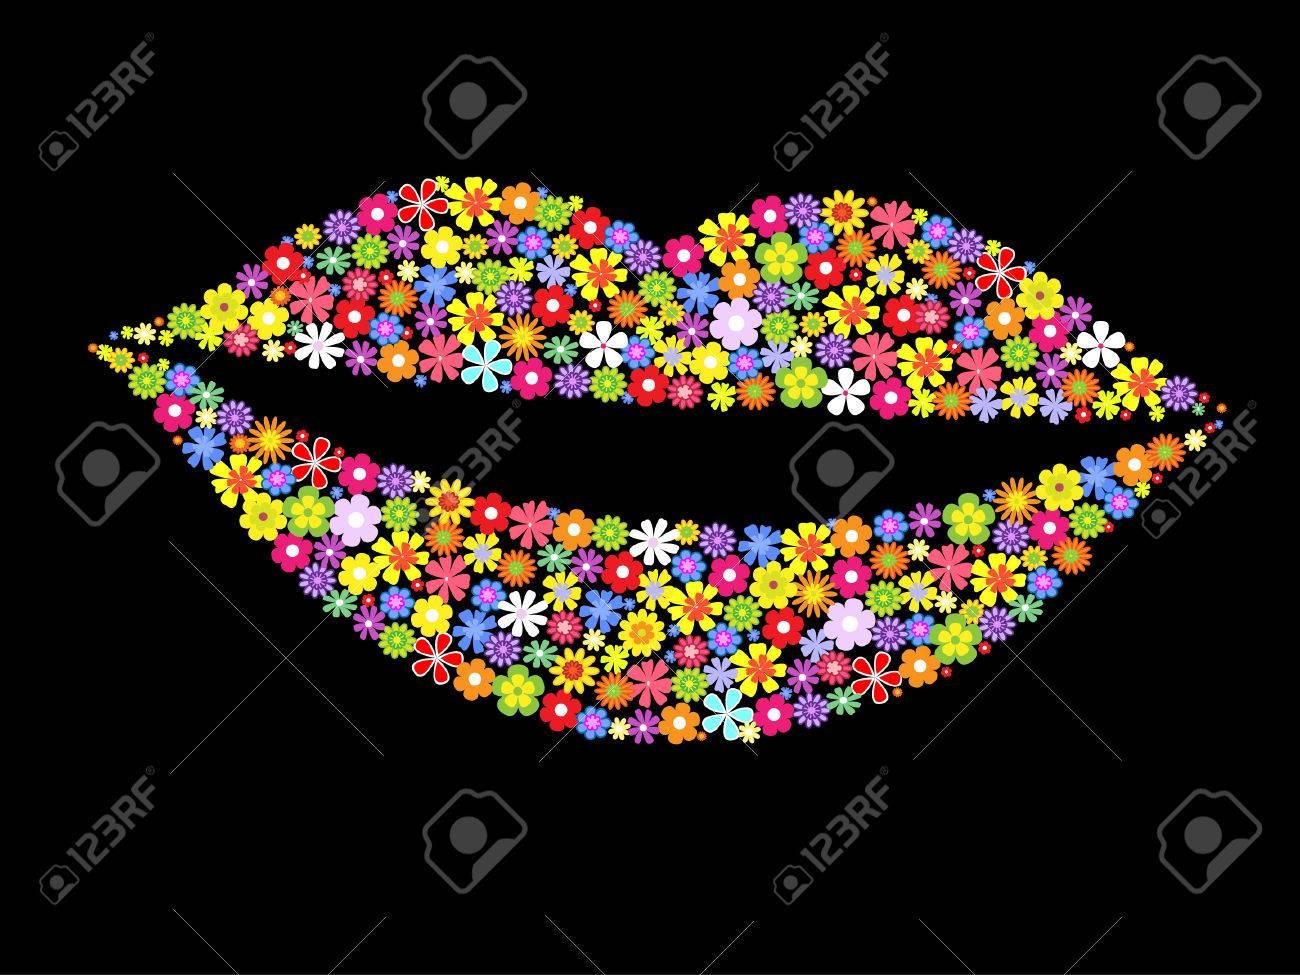 lips of flowers.vector illustration Stock Vector - 8155683